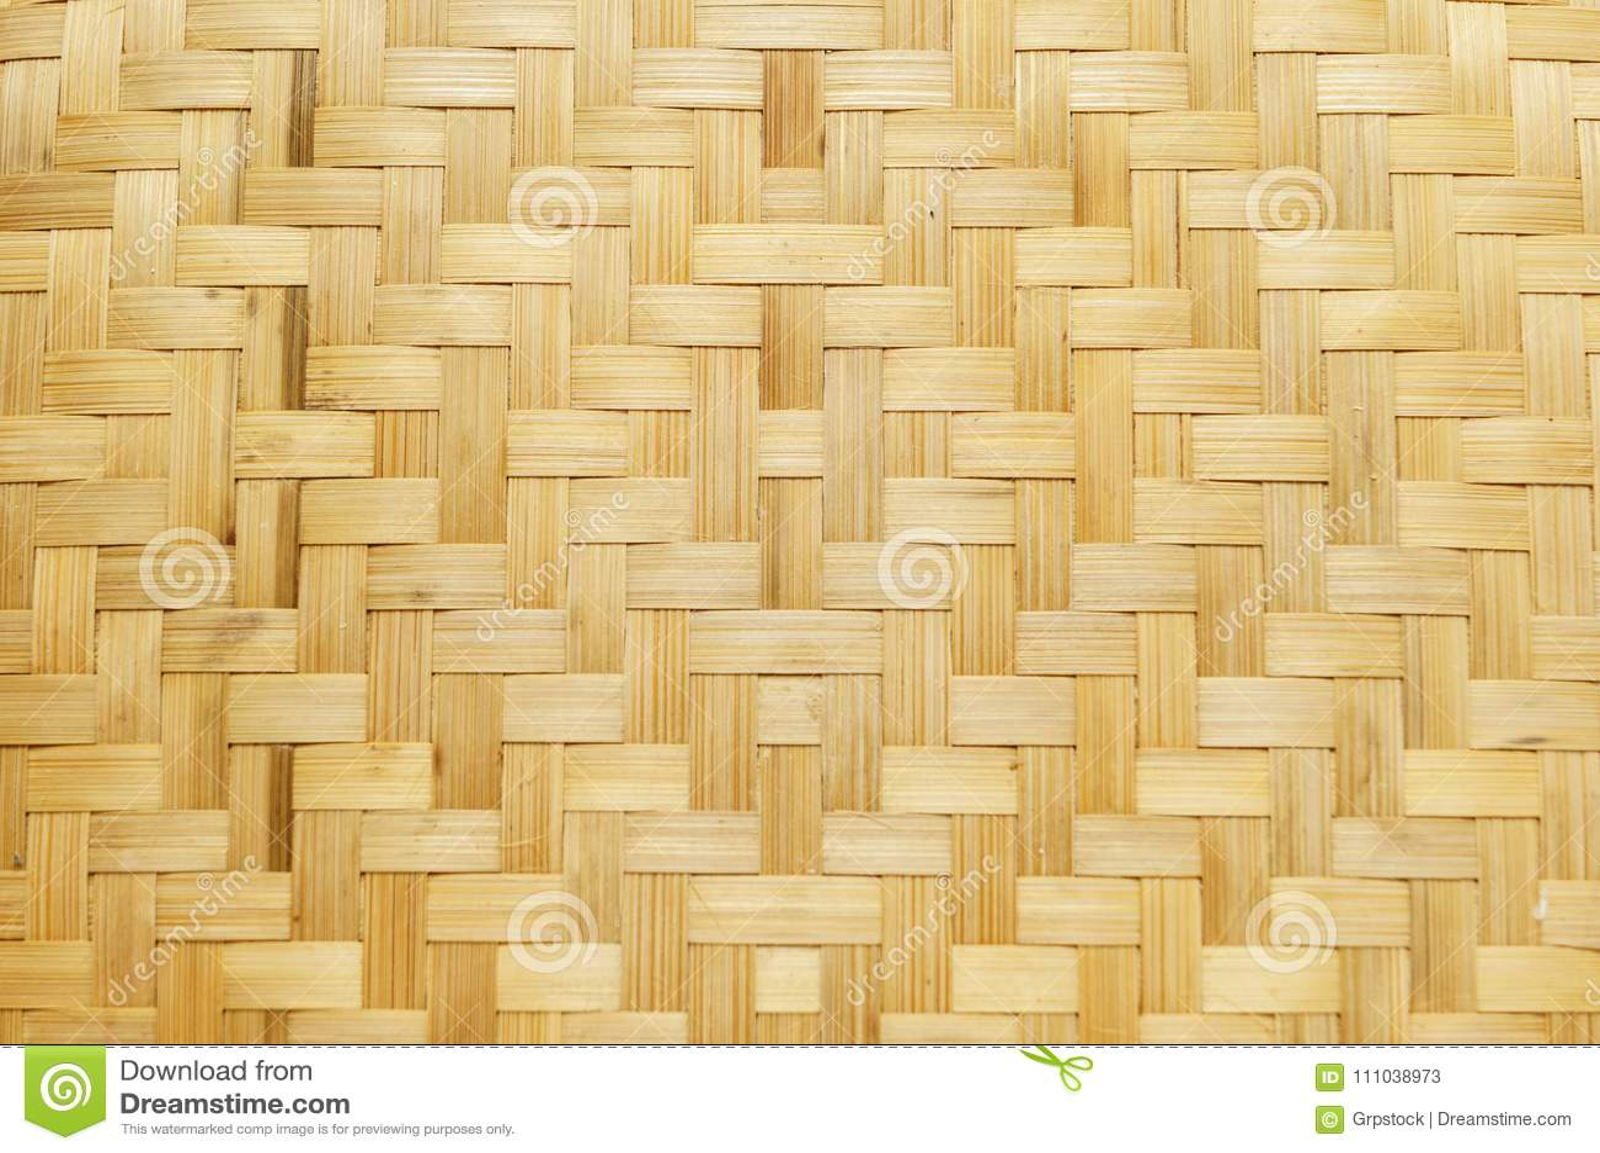 Bamboo Weave Texture Abstract Art Background Handicraft Design